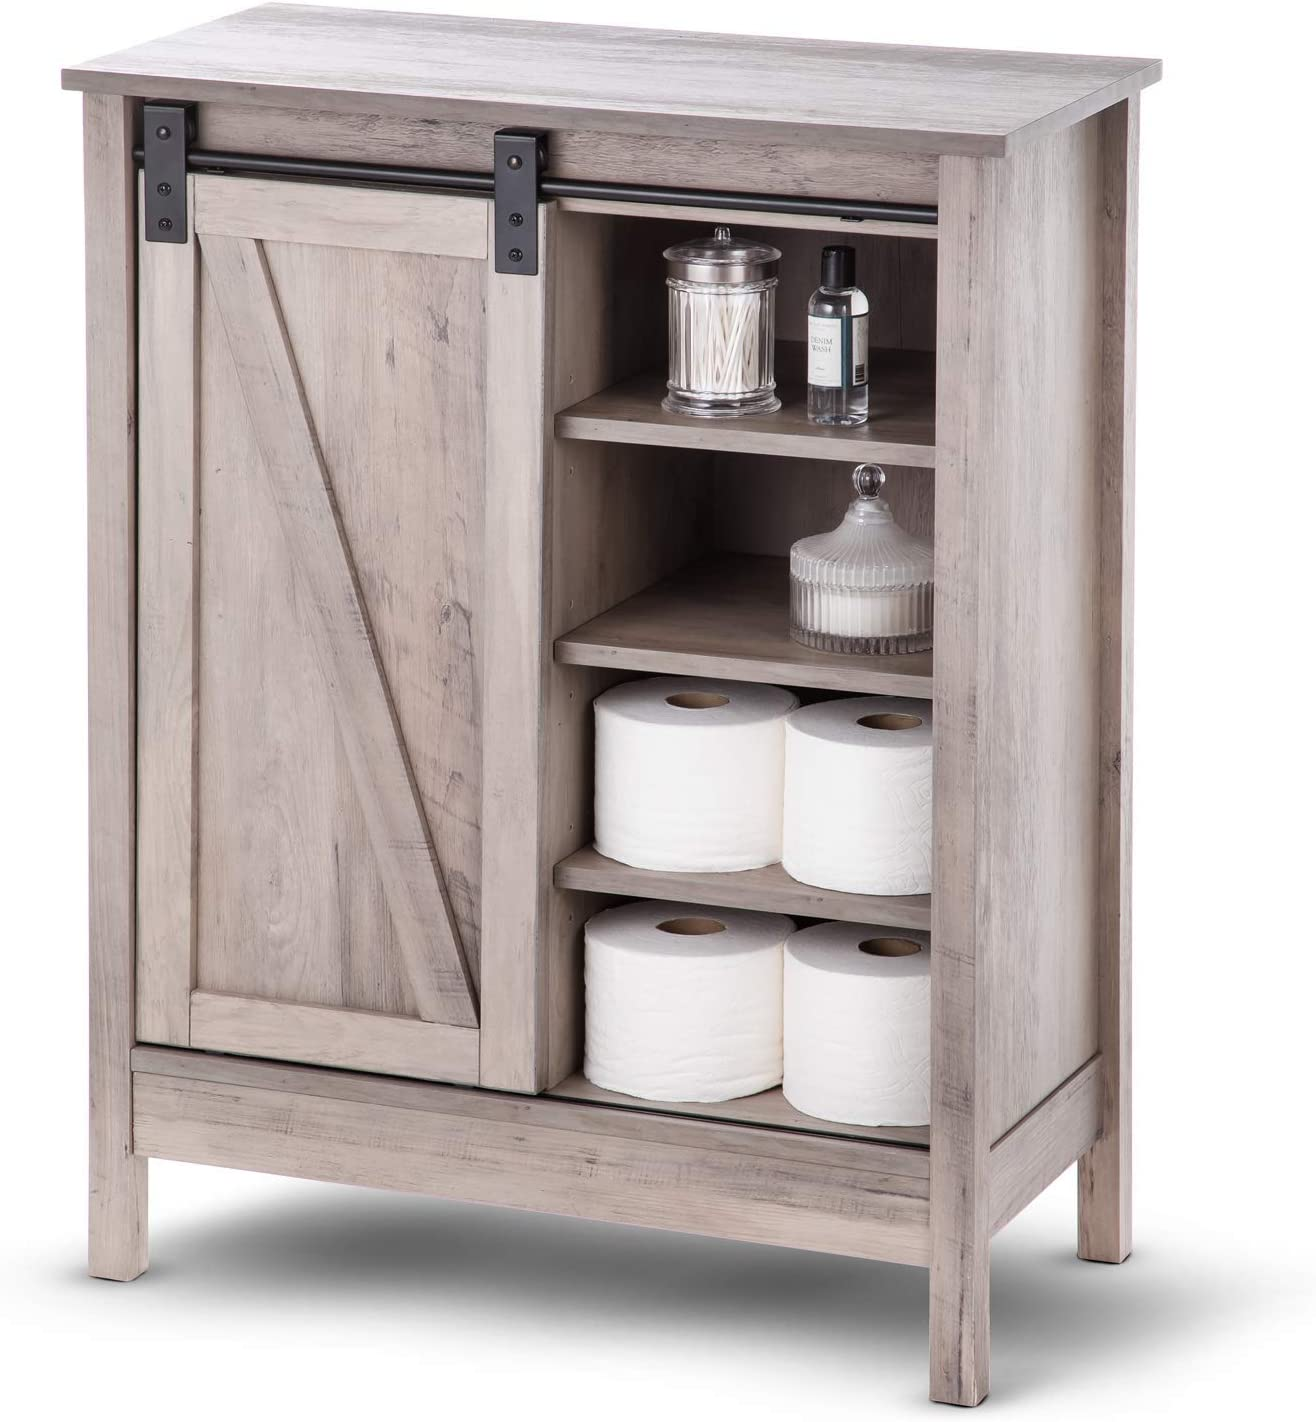 Landia Home Bathroom Storage Cabinet Organization And Storage With Sliding Barn Door Amazon Com